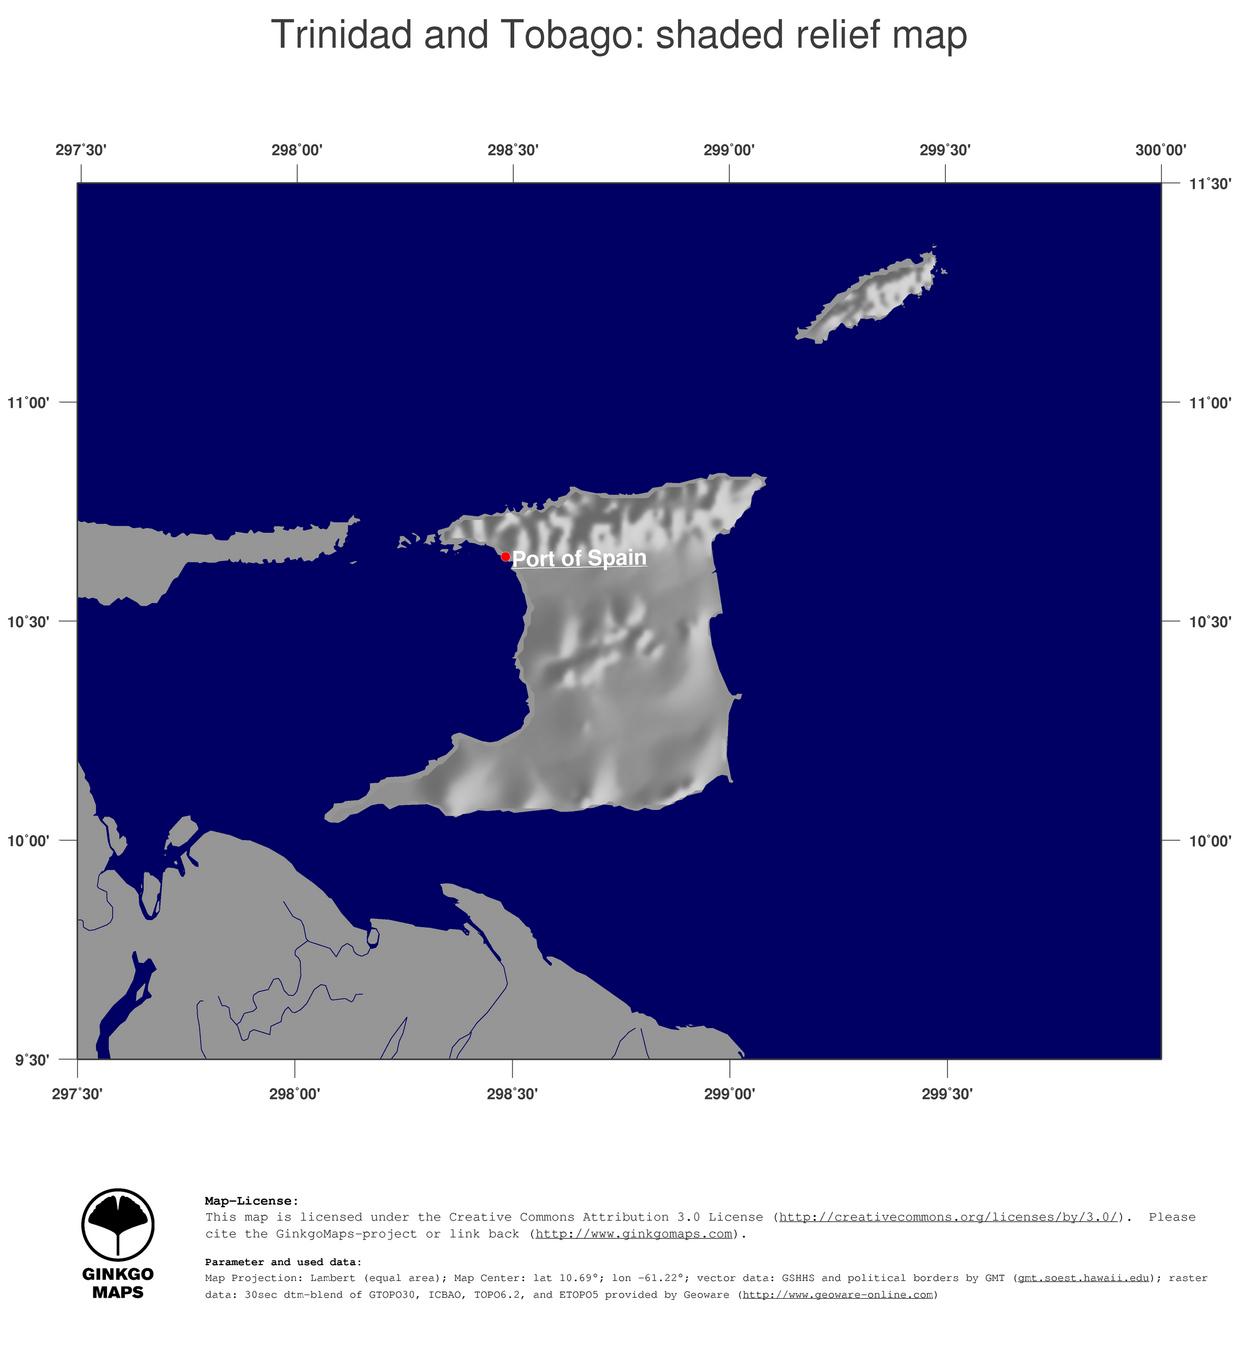 Map Trinidad and Tobago GinkgoMaps continent South America region